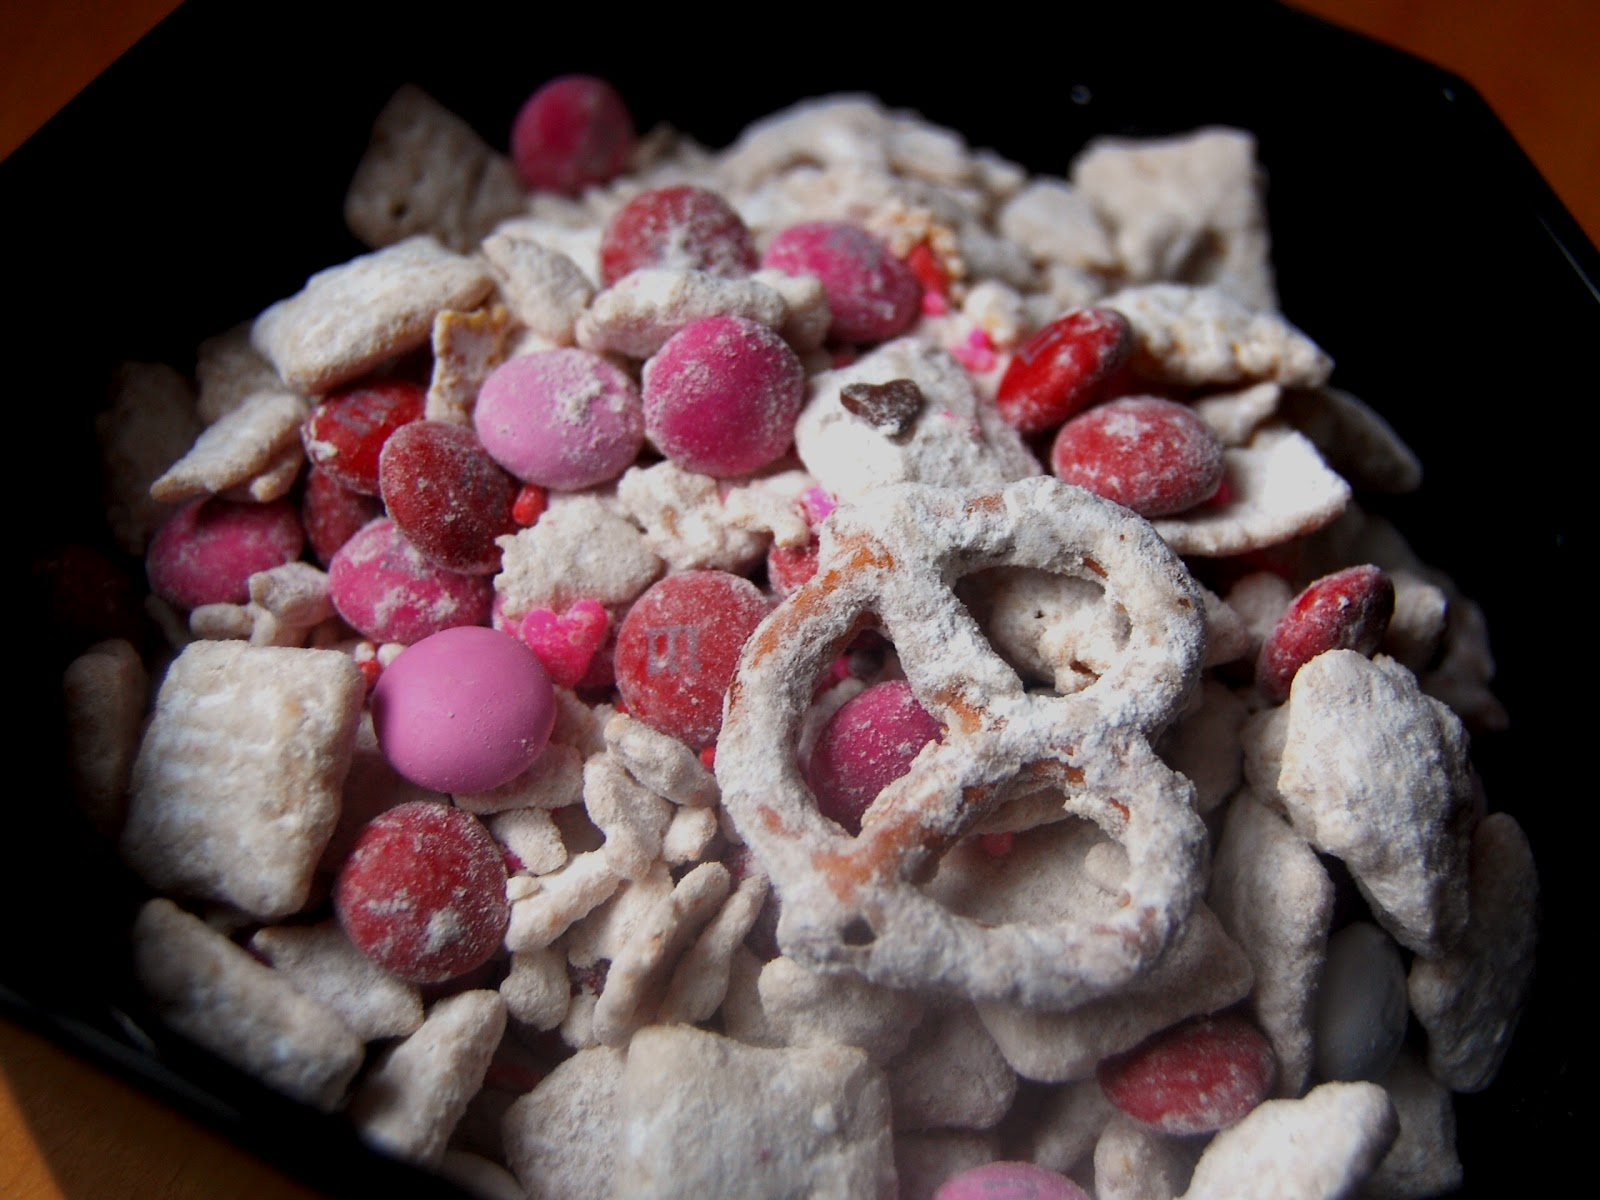 Sweet Valentineu0027s Day Treats: Puppy {Love} Chow, Red Velvet Popcorn, And  Red Velvet Cookies And Cream Milkshakes